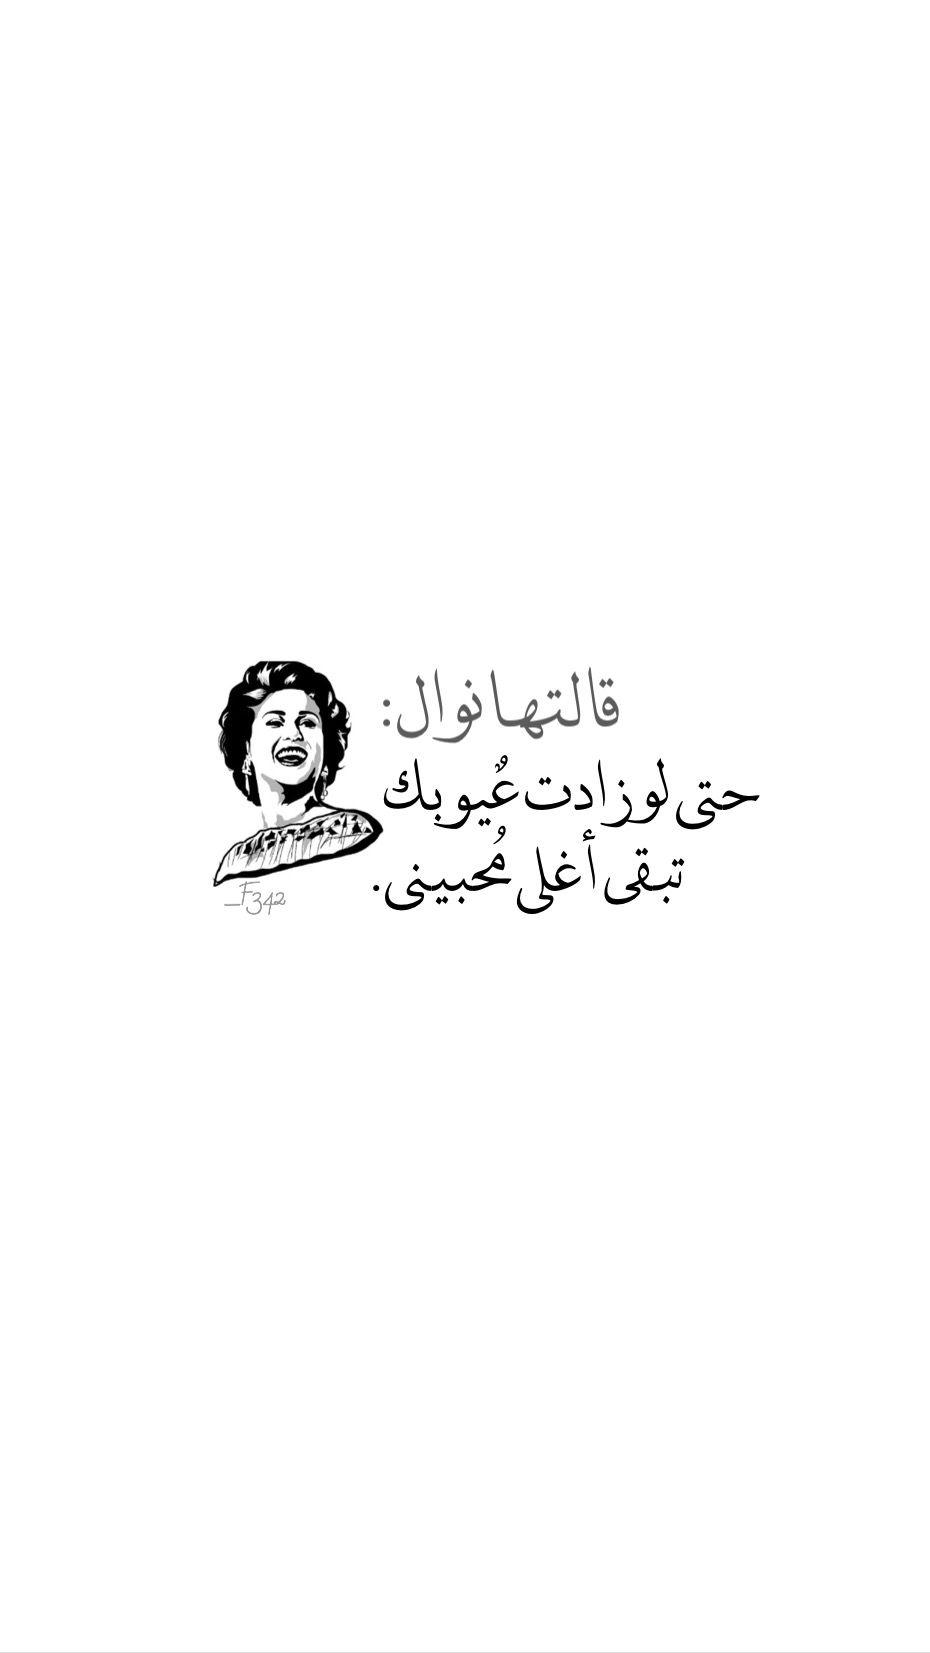 نوال الكويتيه اقتباسات Quotes For Book Lovers Beautiful Arabic Words Words Quotes